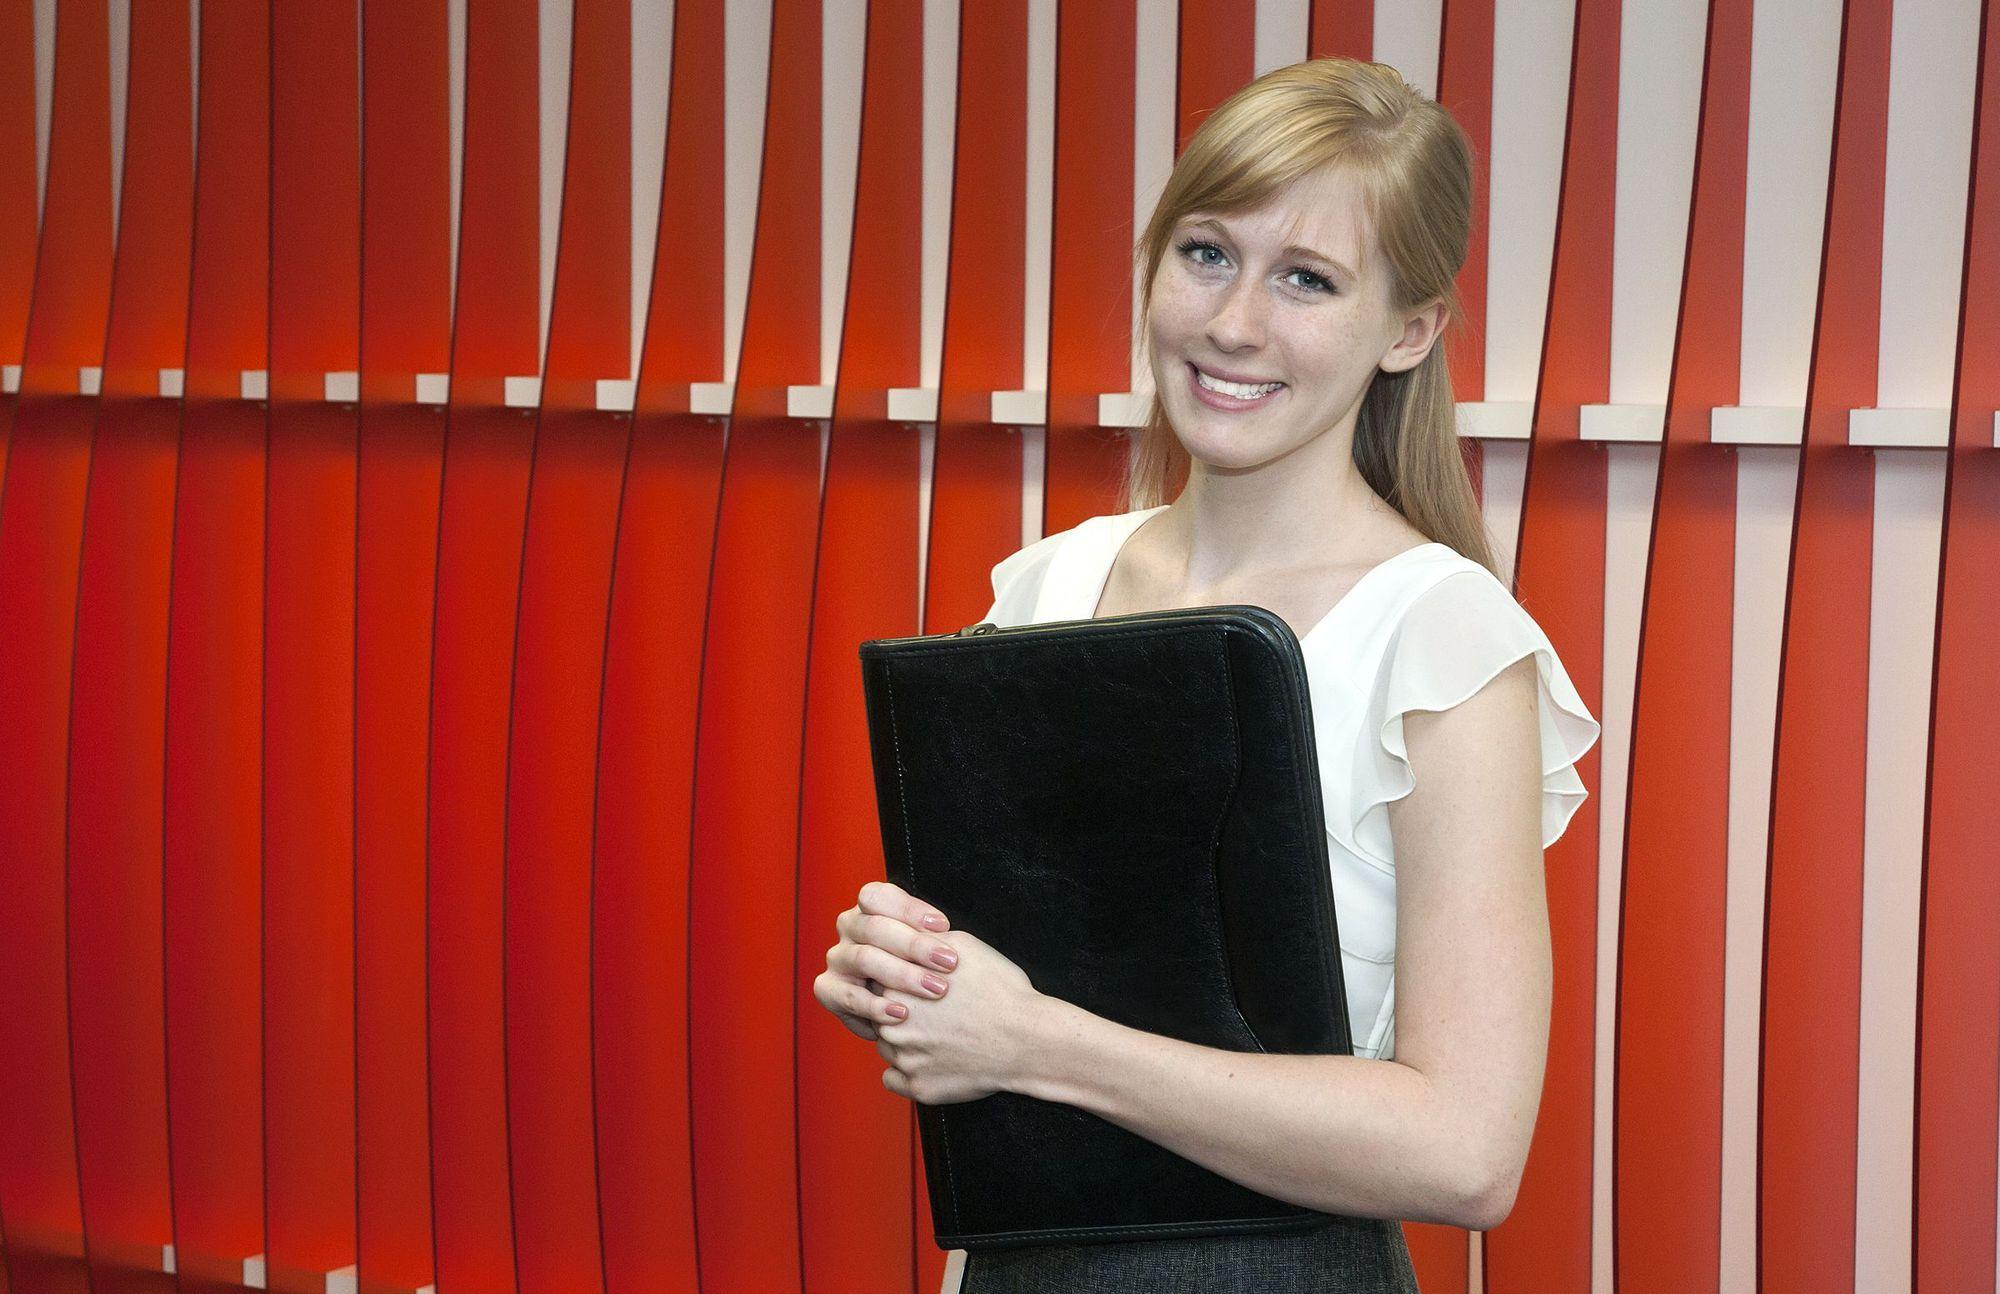 On the Job with Nicole Kor | University of minnesota, Work ...